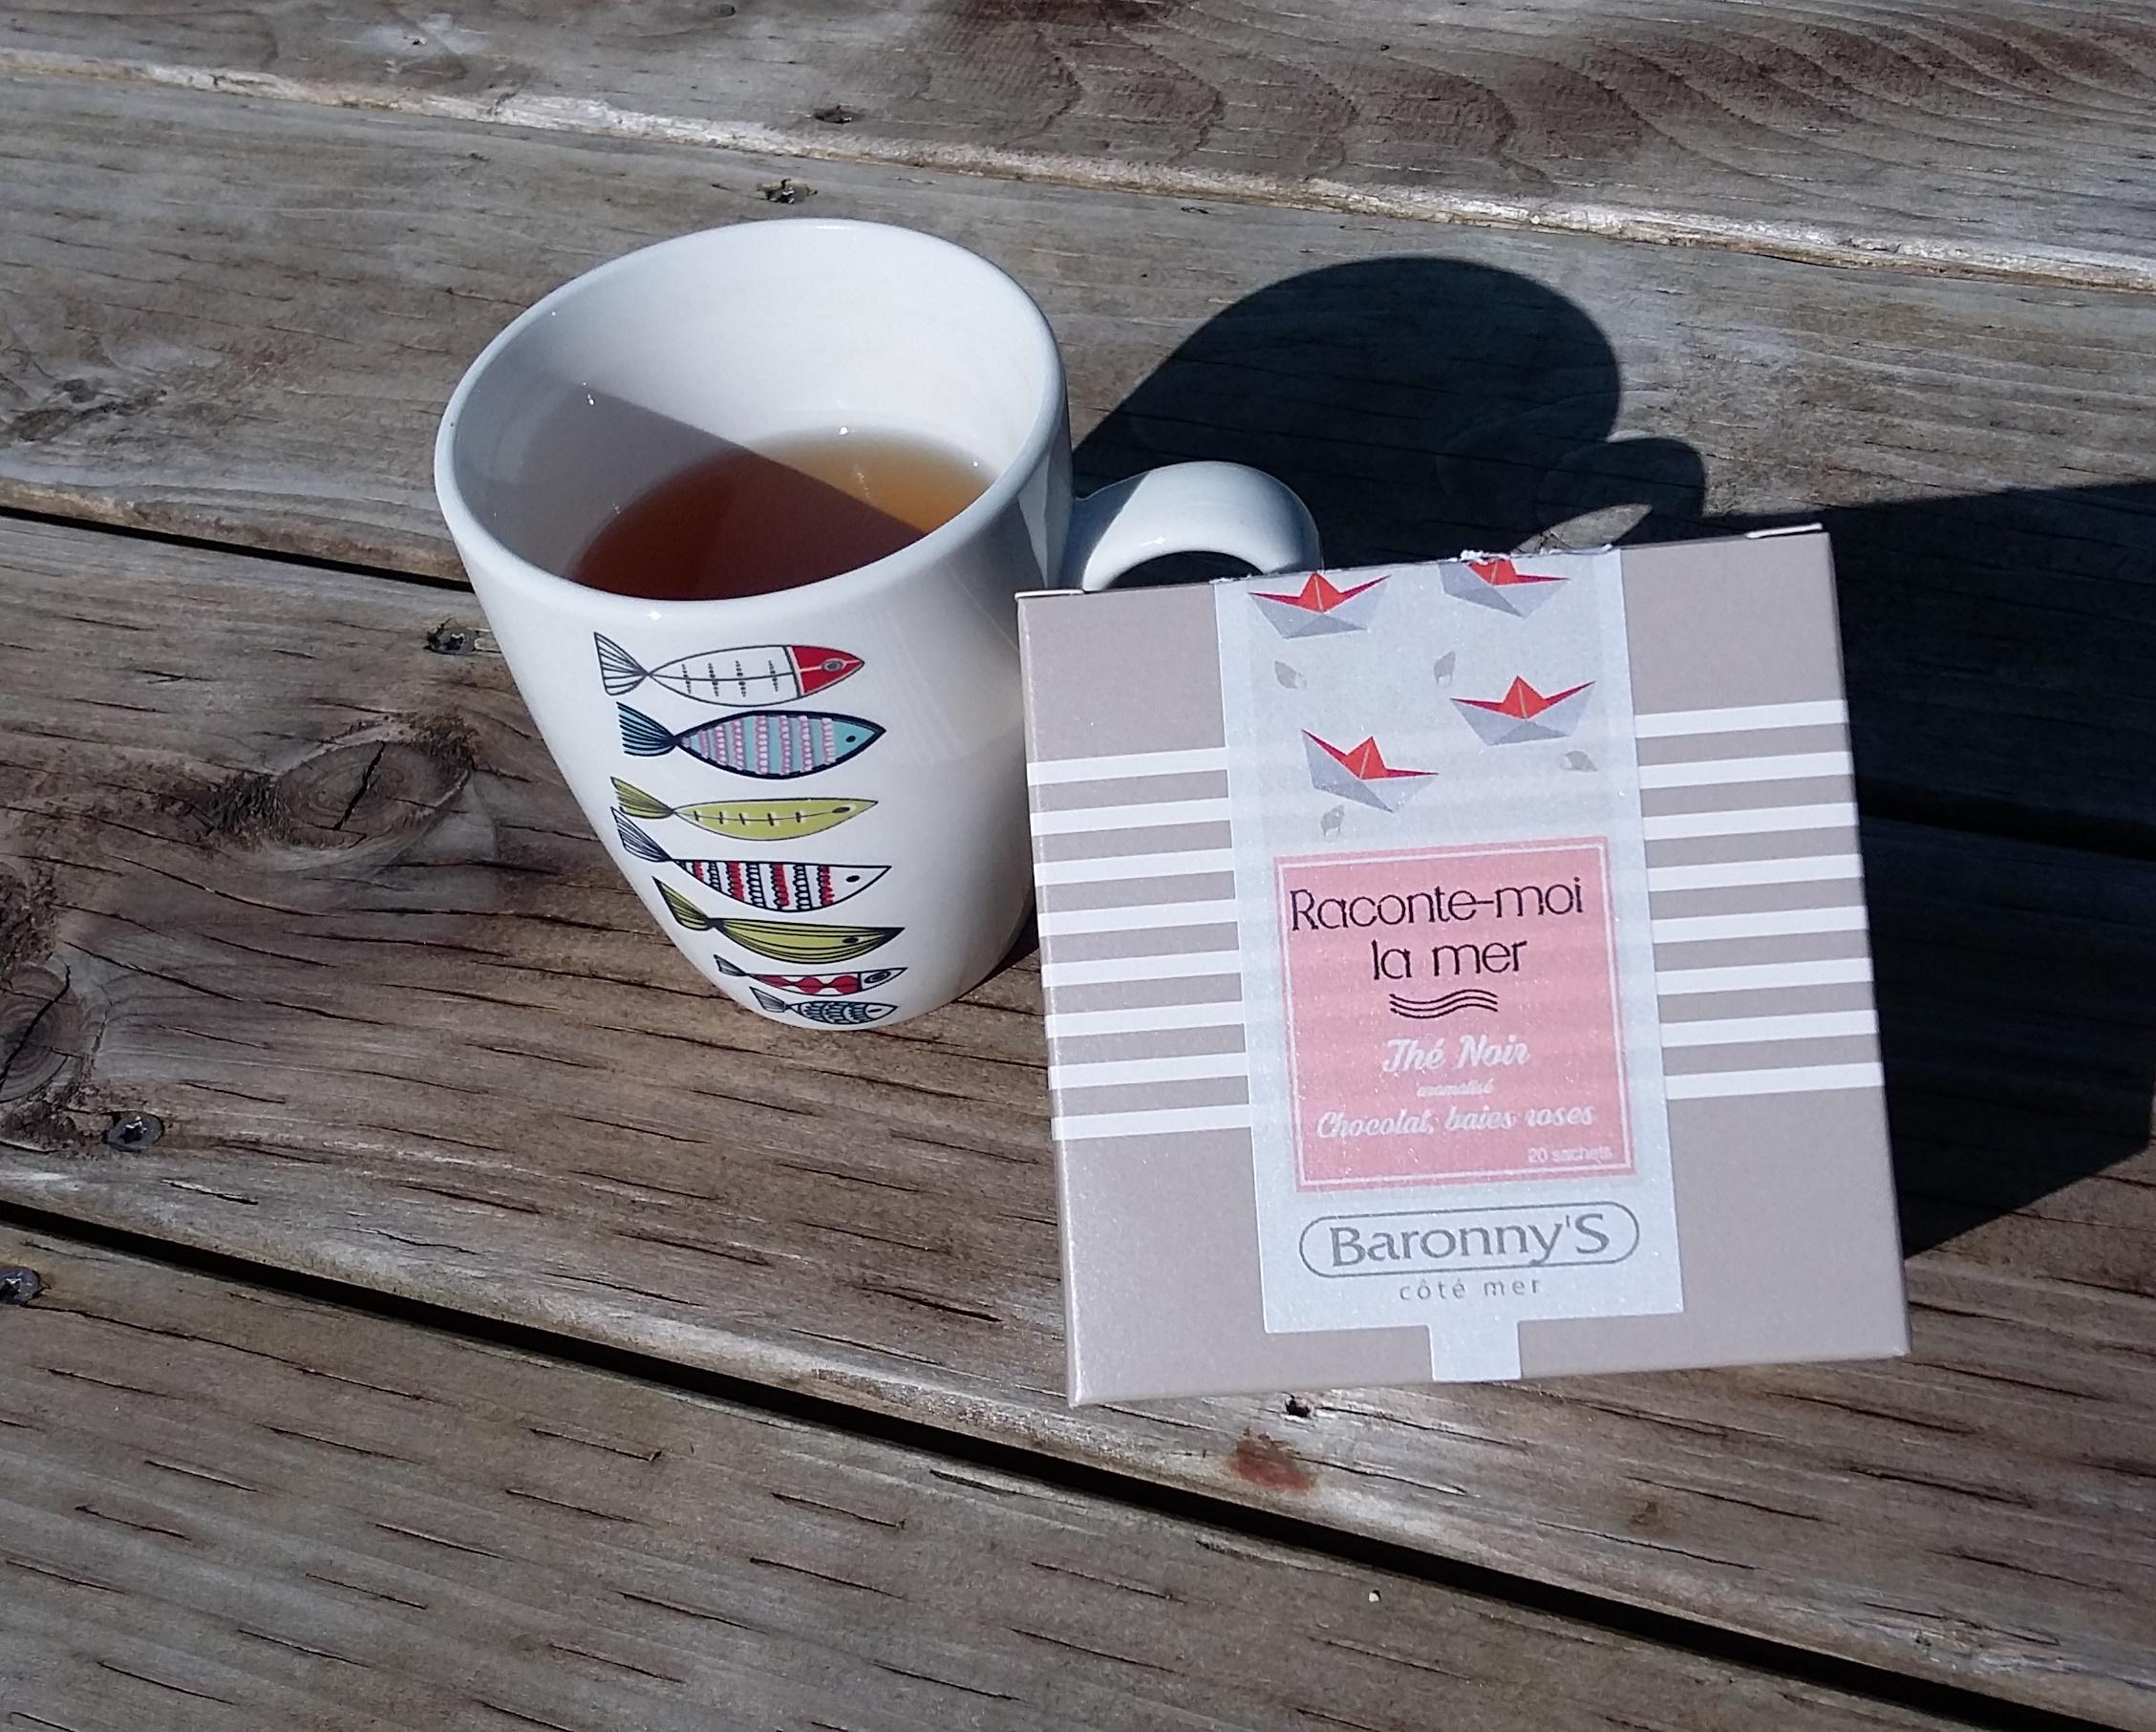 thé breton